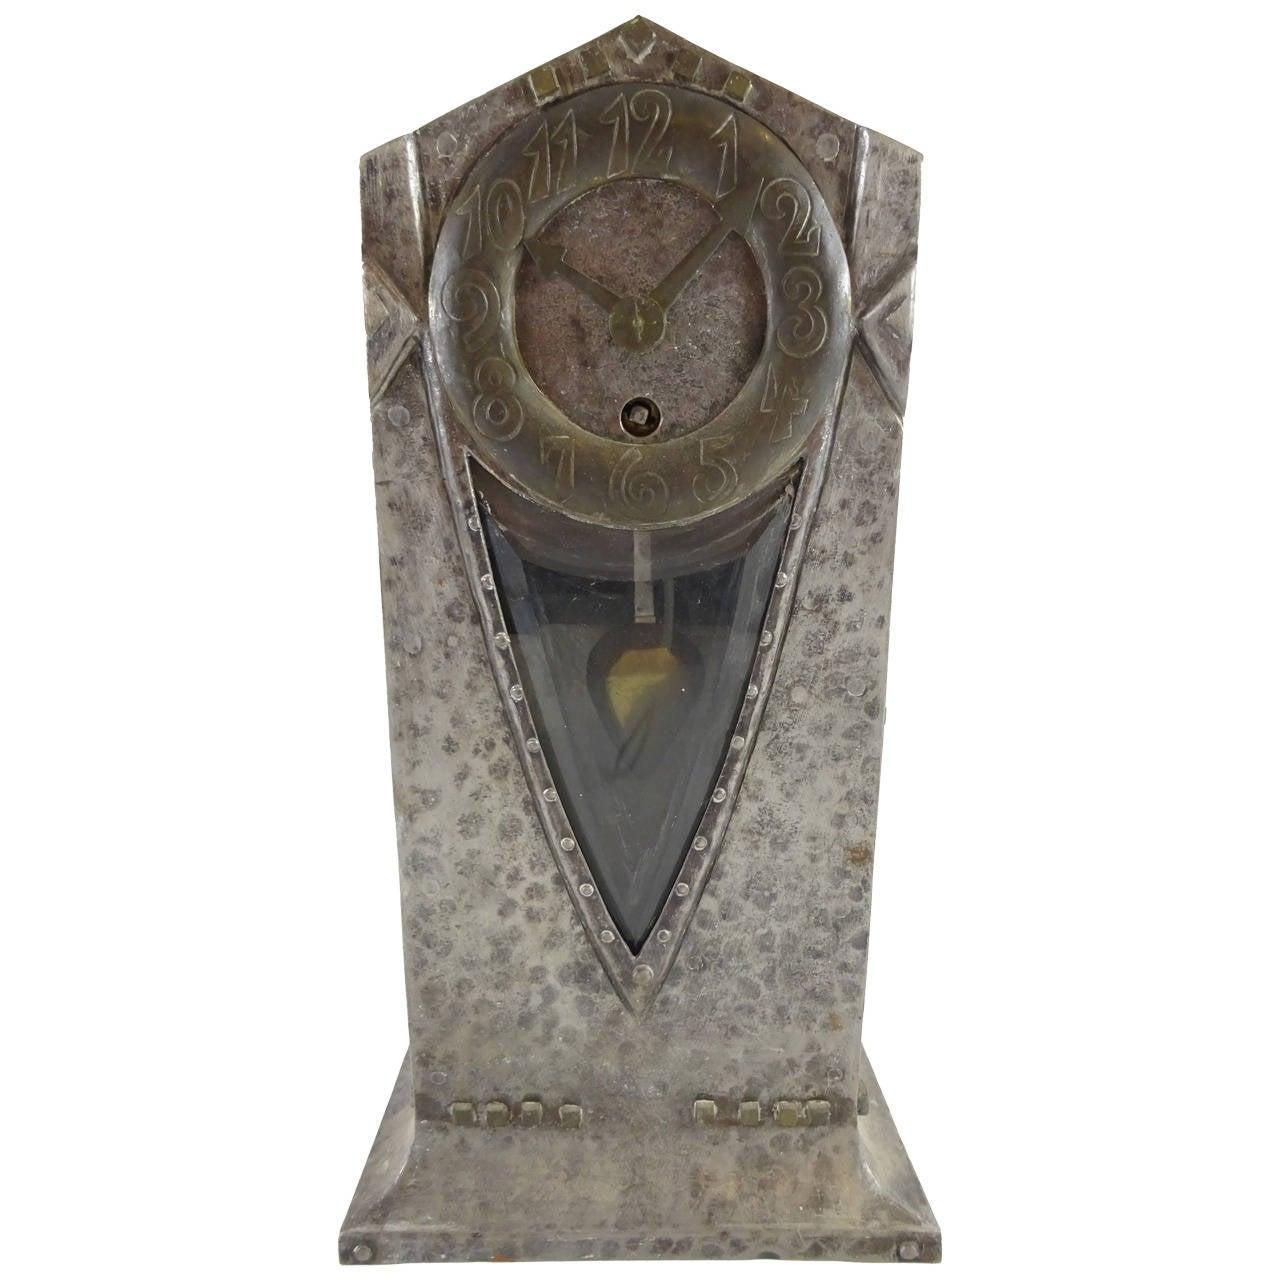 Ludwig Hohlwein Iron Clock